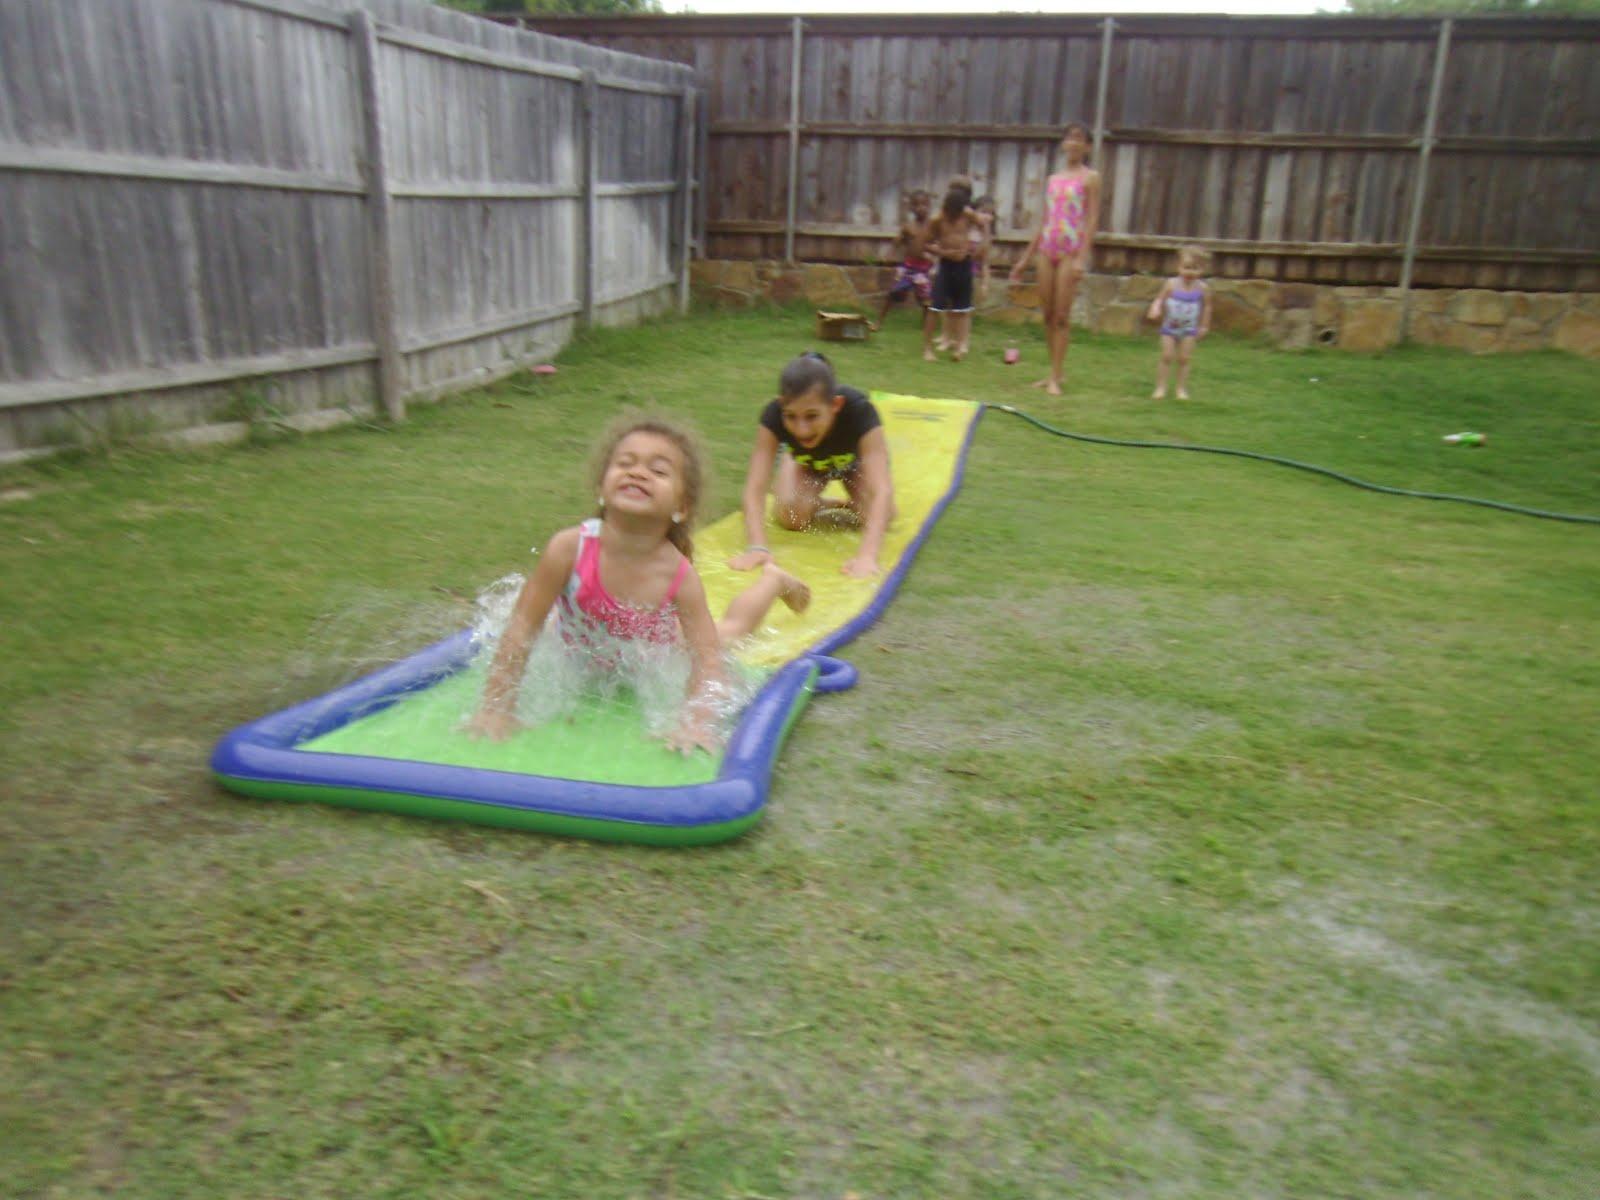 Huge Backyard Slide : The Big Texas Hill Family Daycare kids backyard slip n slide )